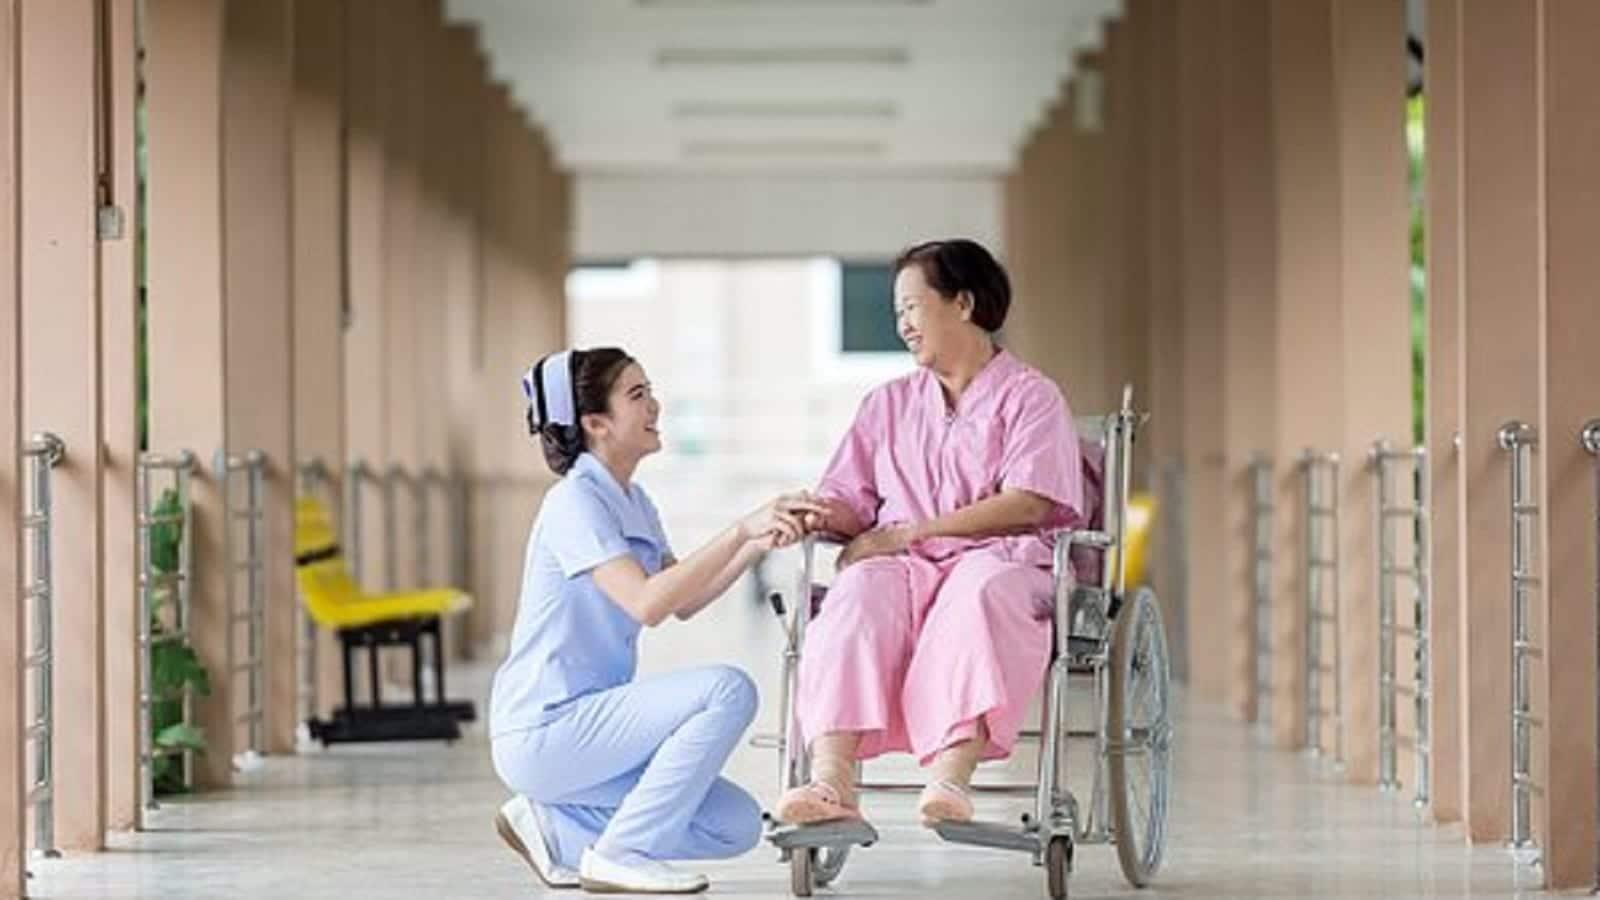 Elderly Woman Wheelchair Stock Photo